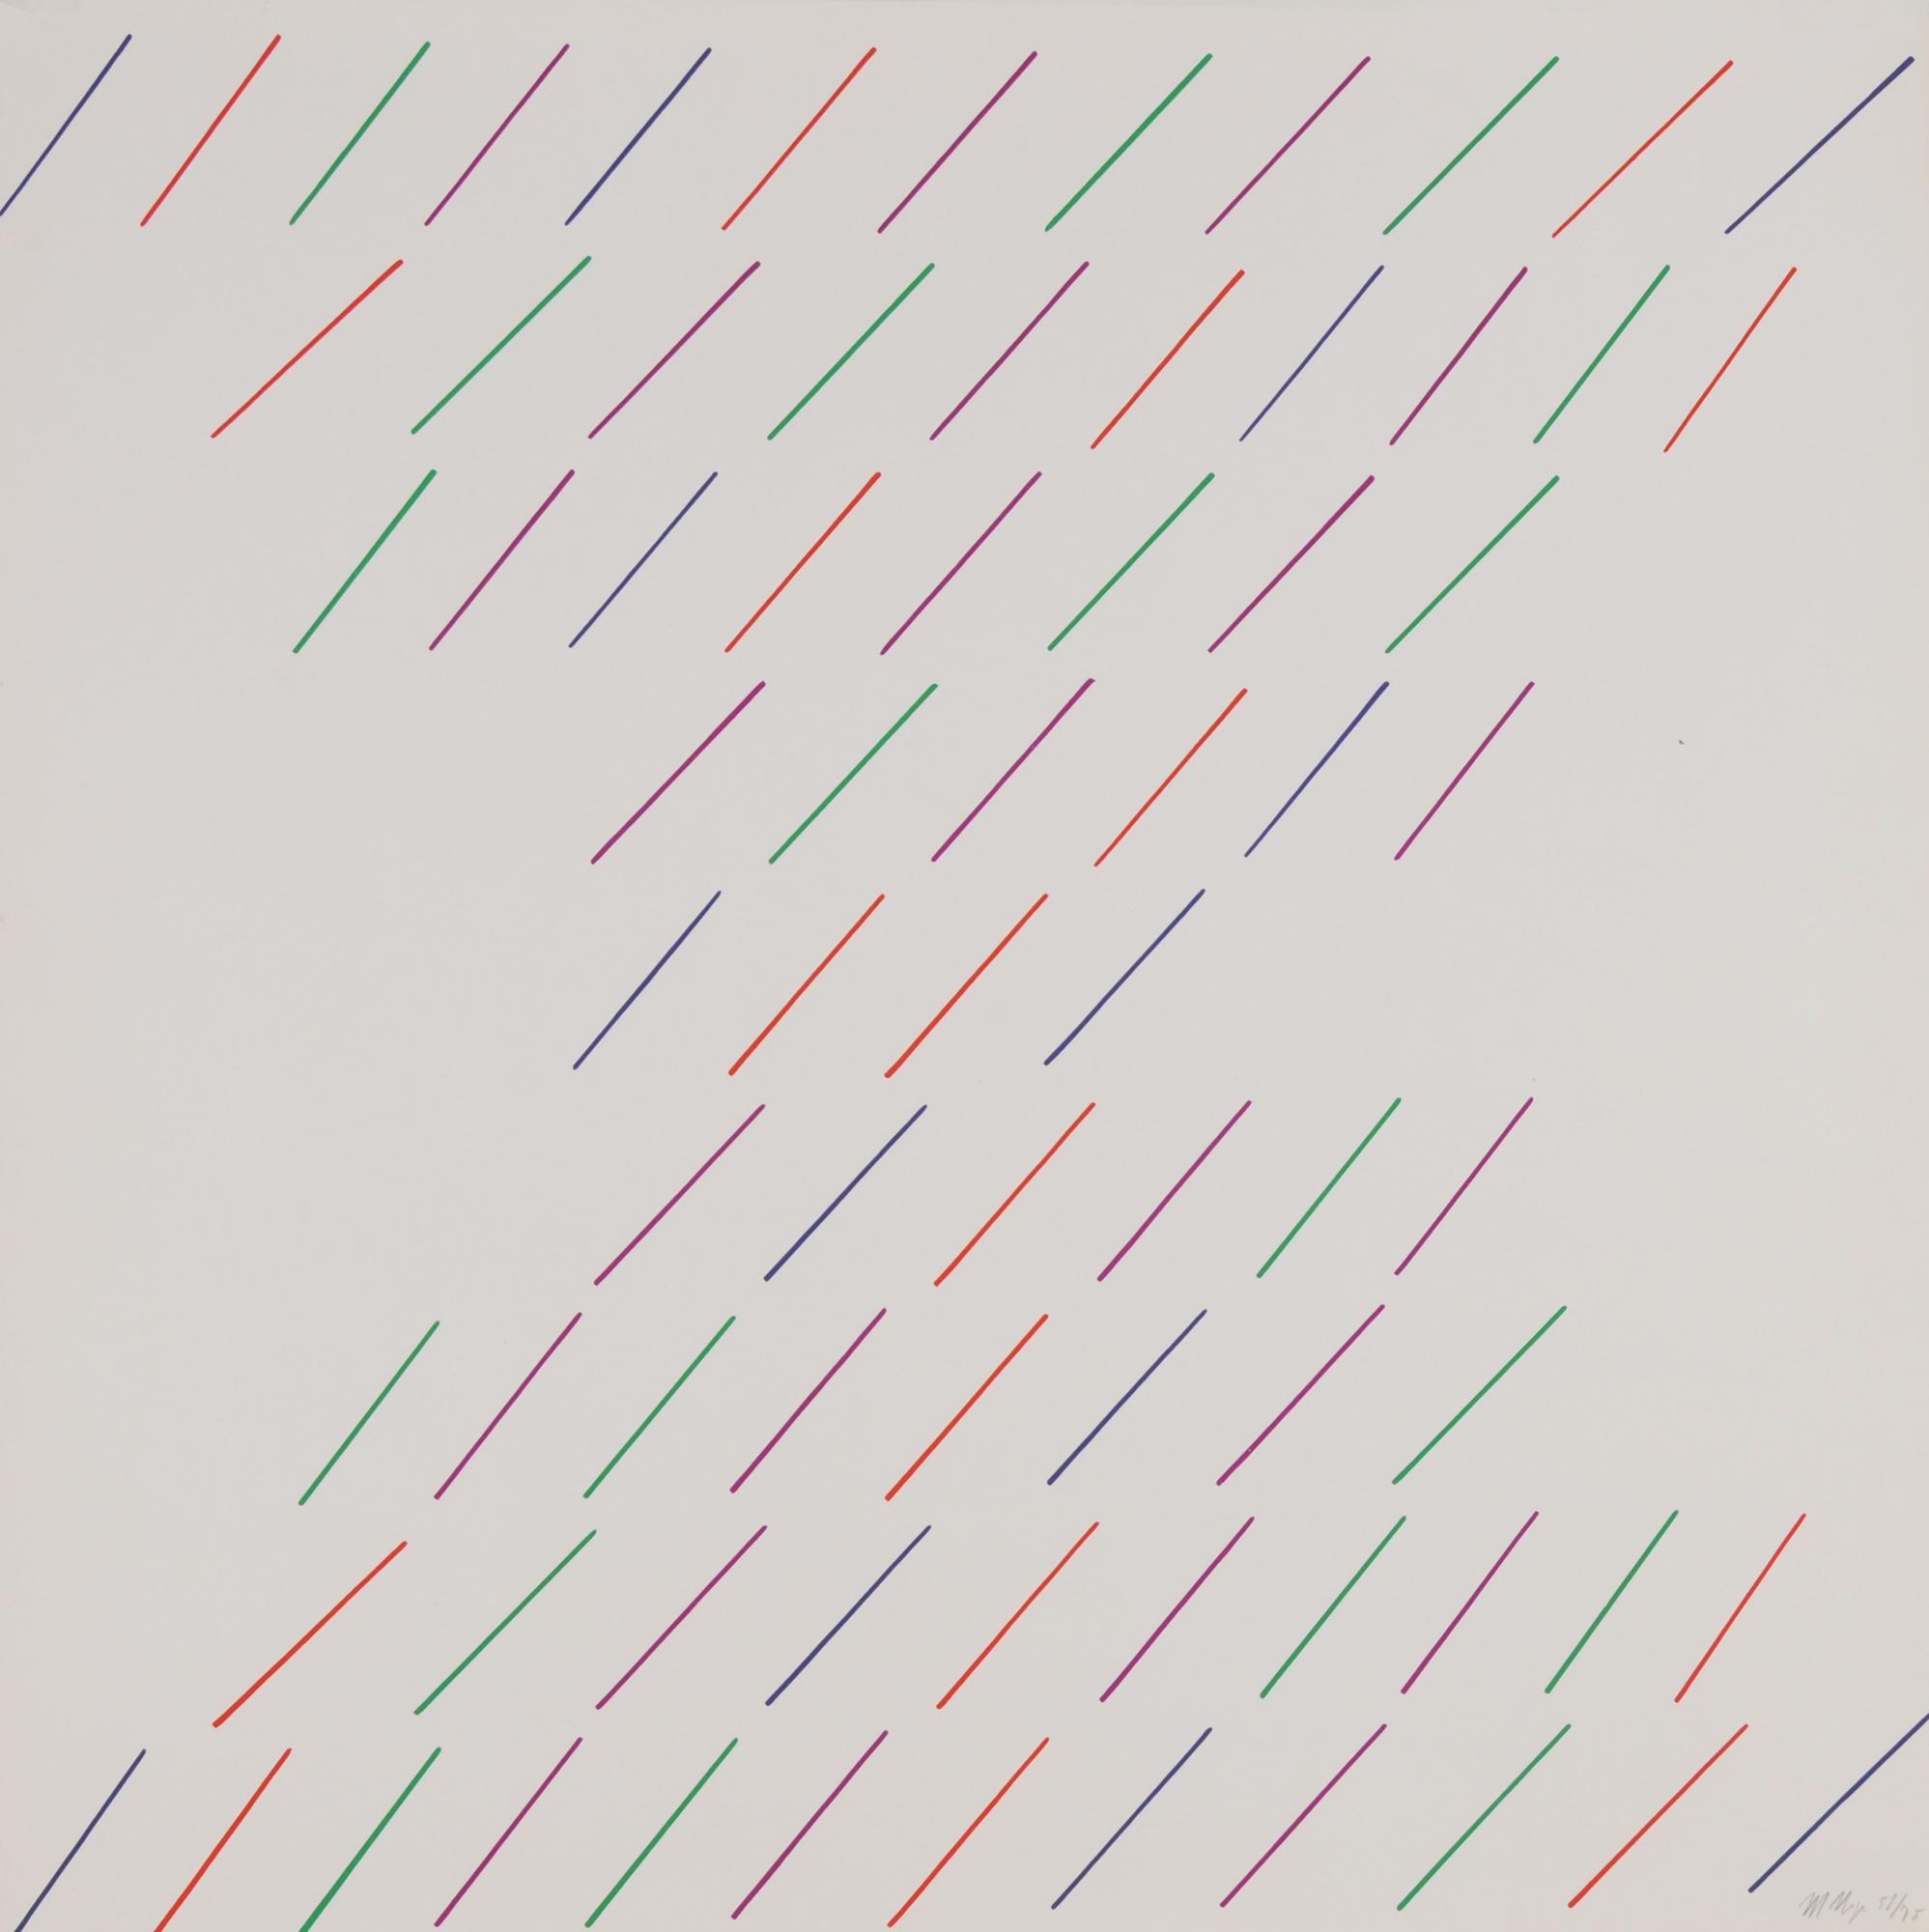 Nigro Mario, 8 sheets: Untitled